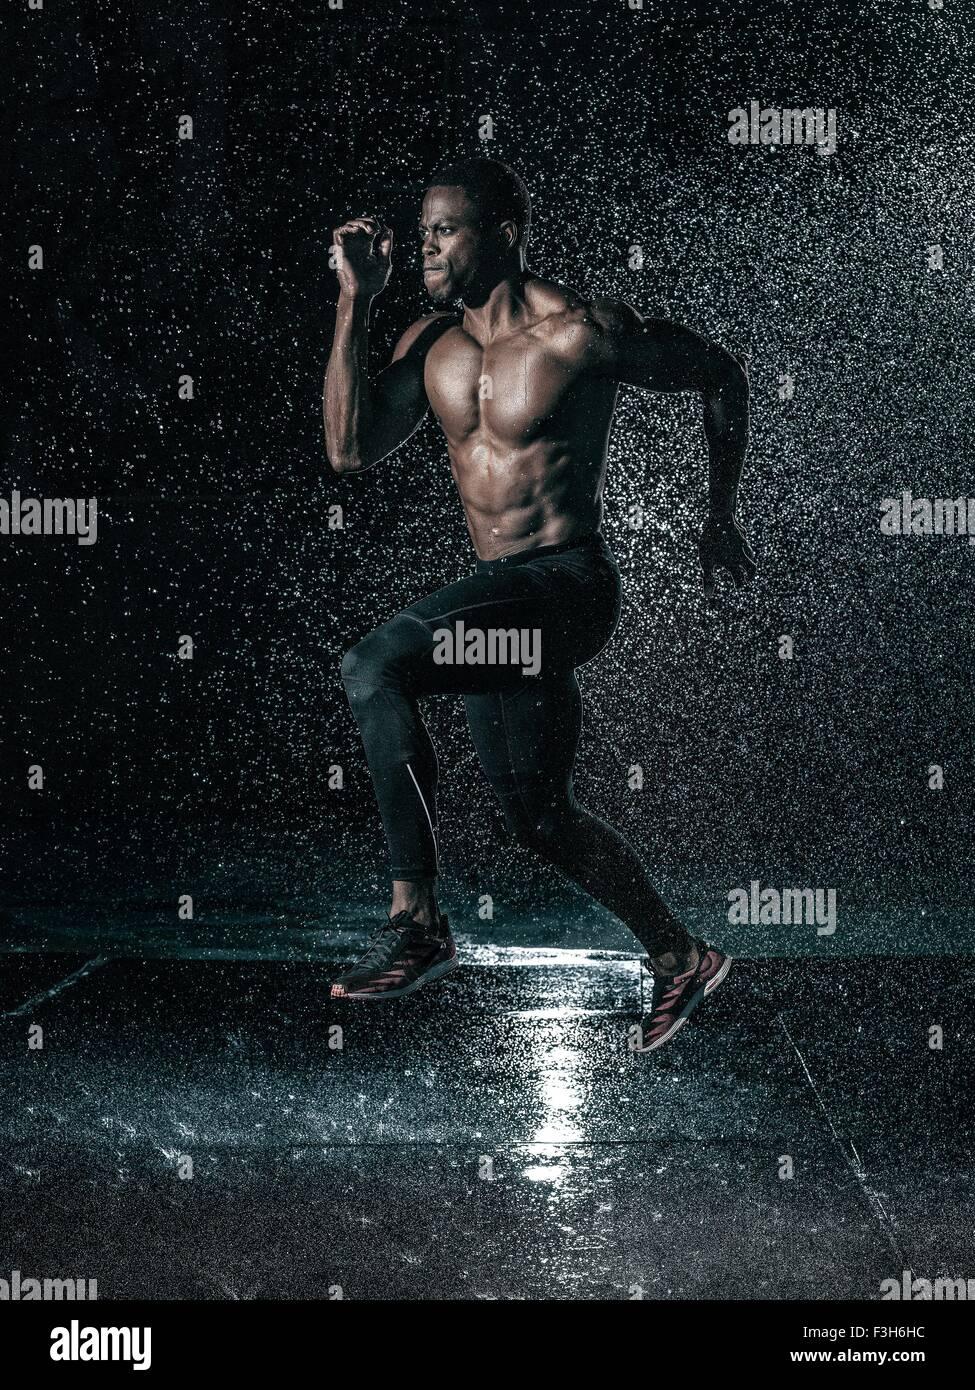 MId adult man, outdoors, running in rain - Stock Image